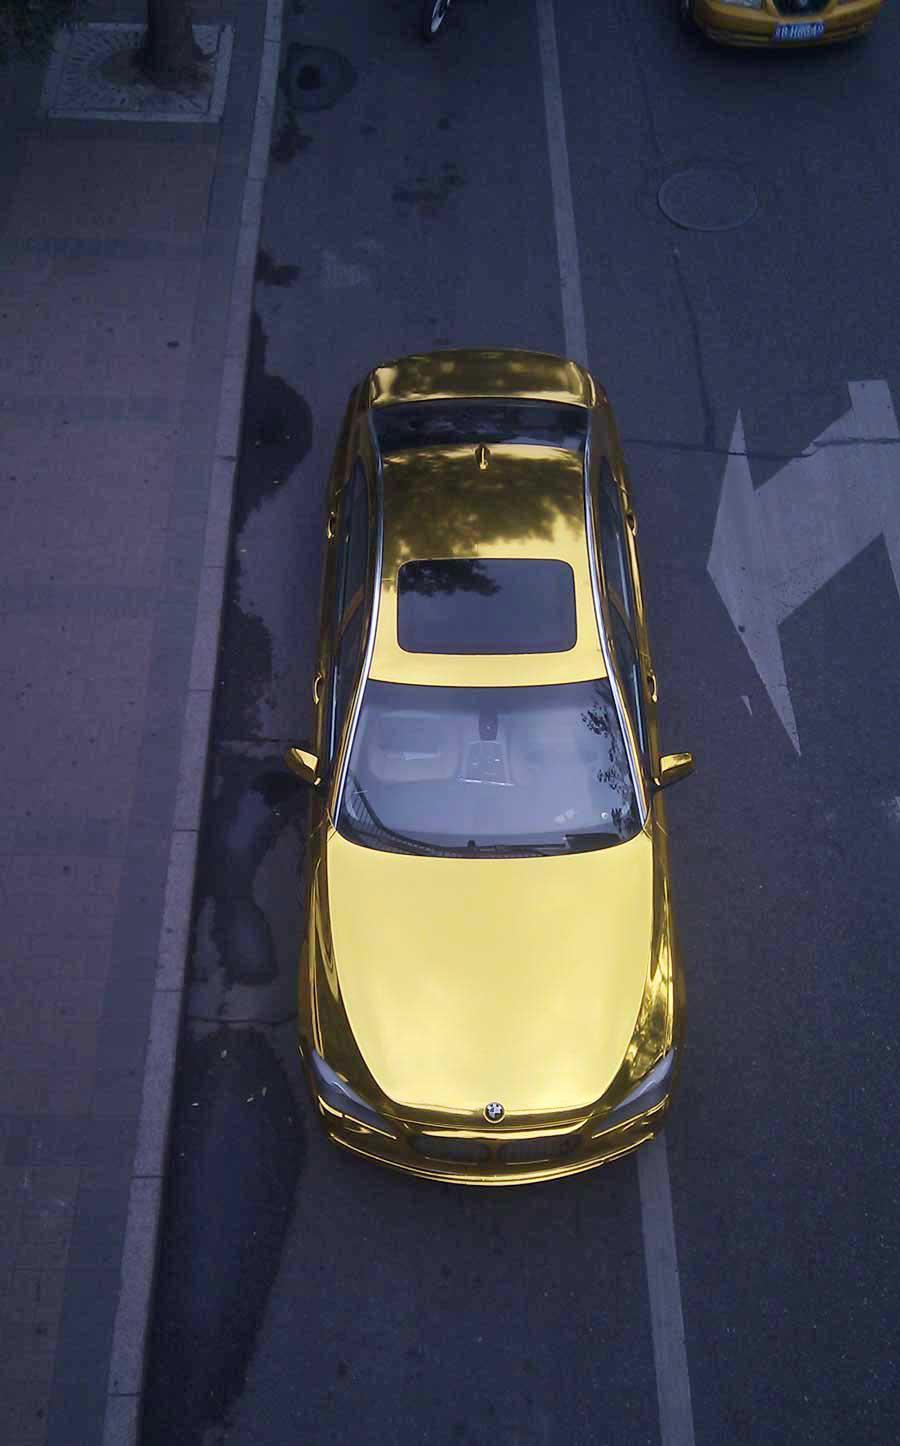 Gold BMW sedan seen in Beijing